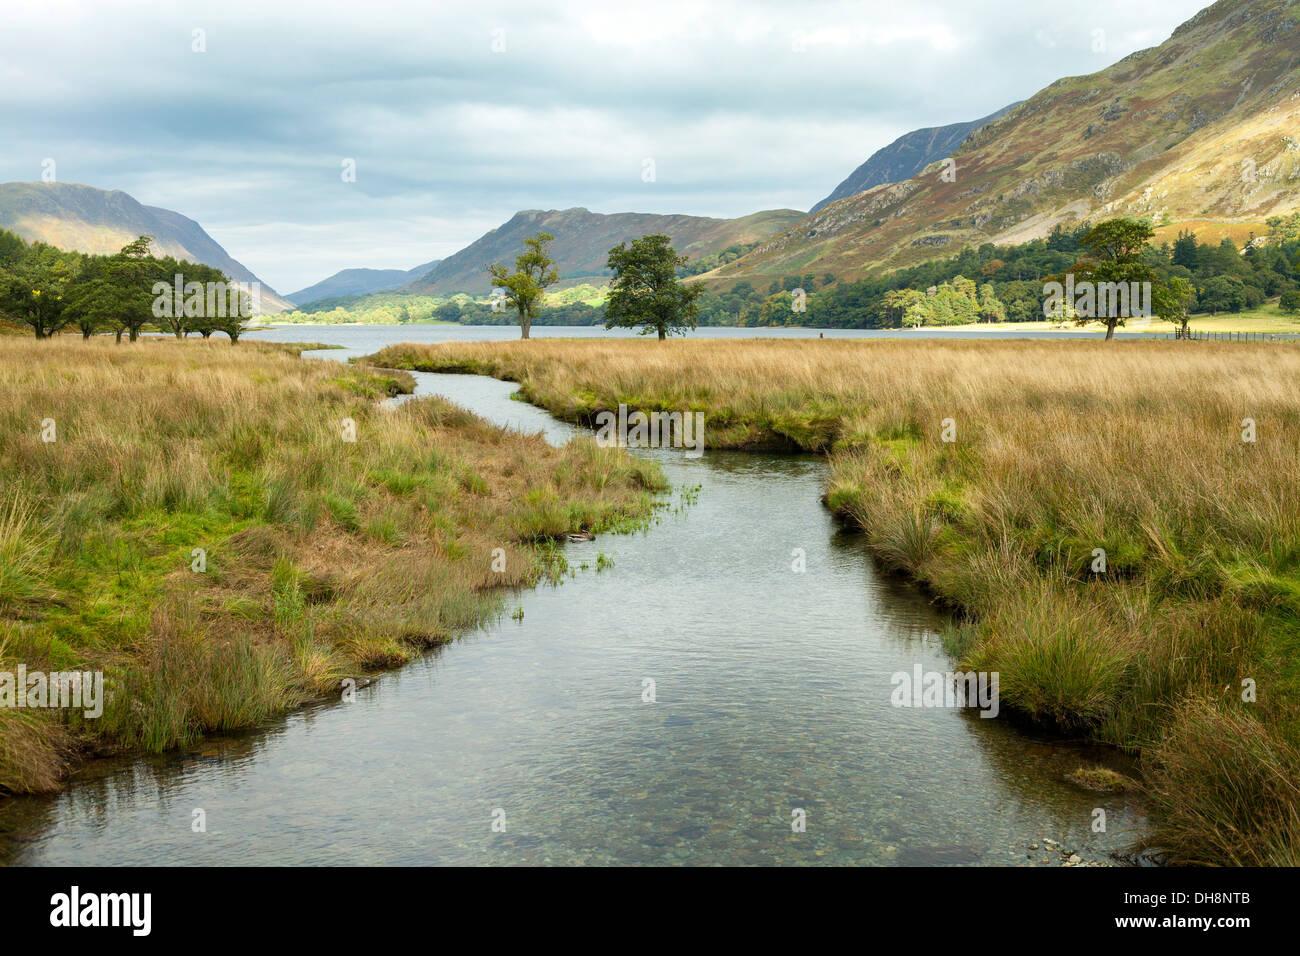 Buttermere Lake, Lake District, UK - Stock Image